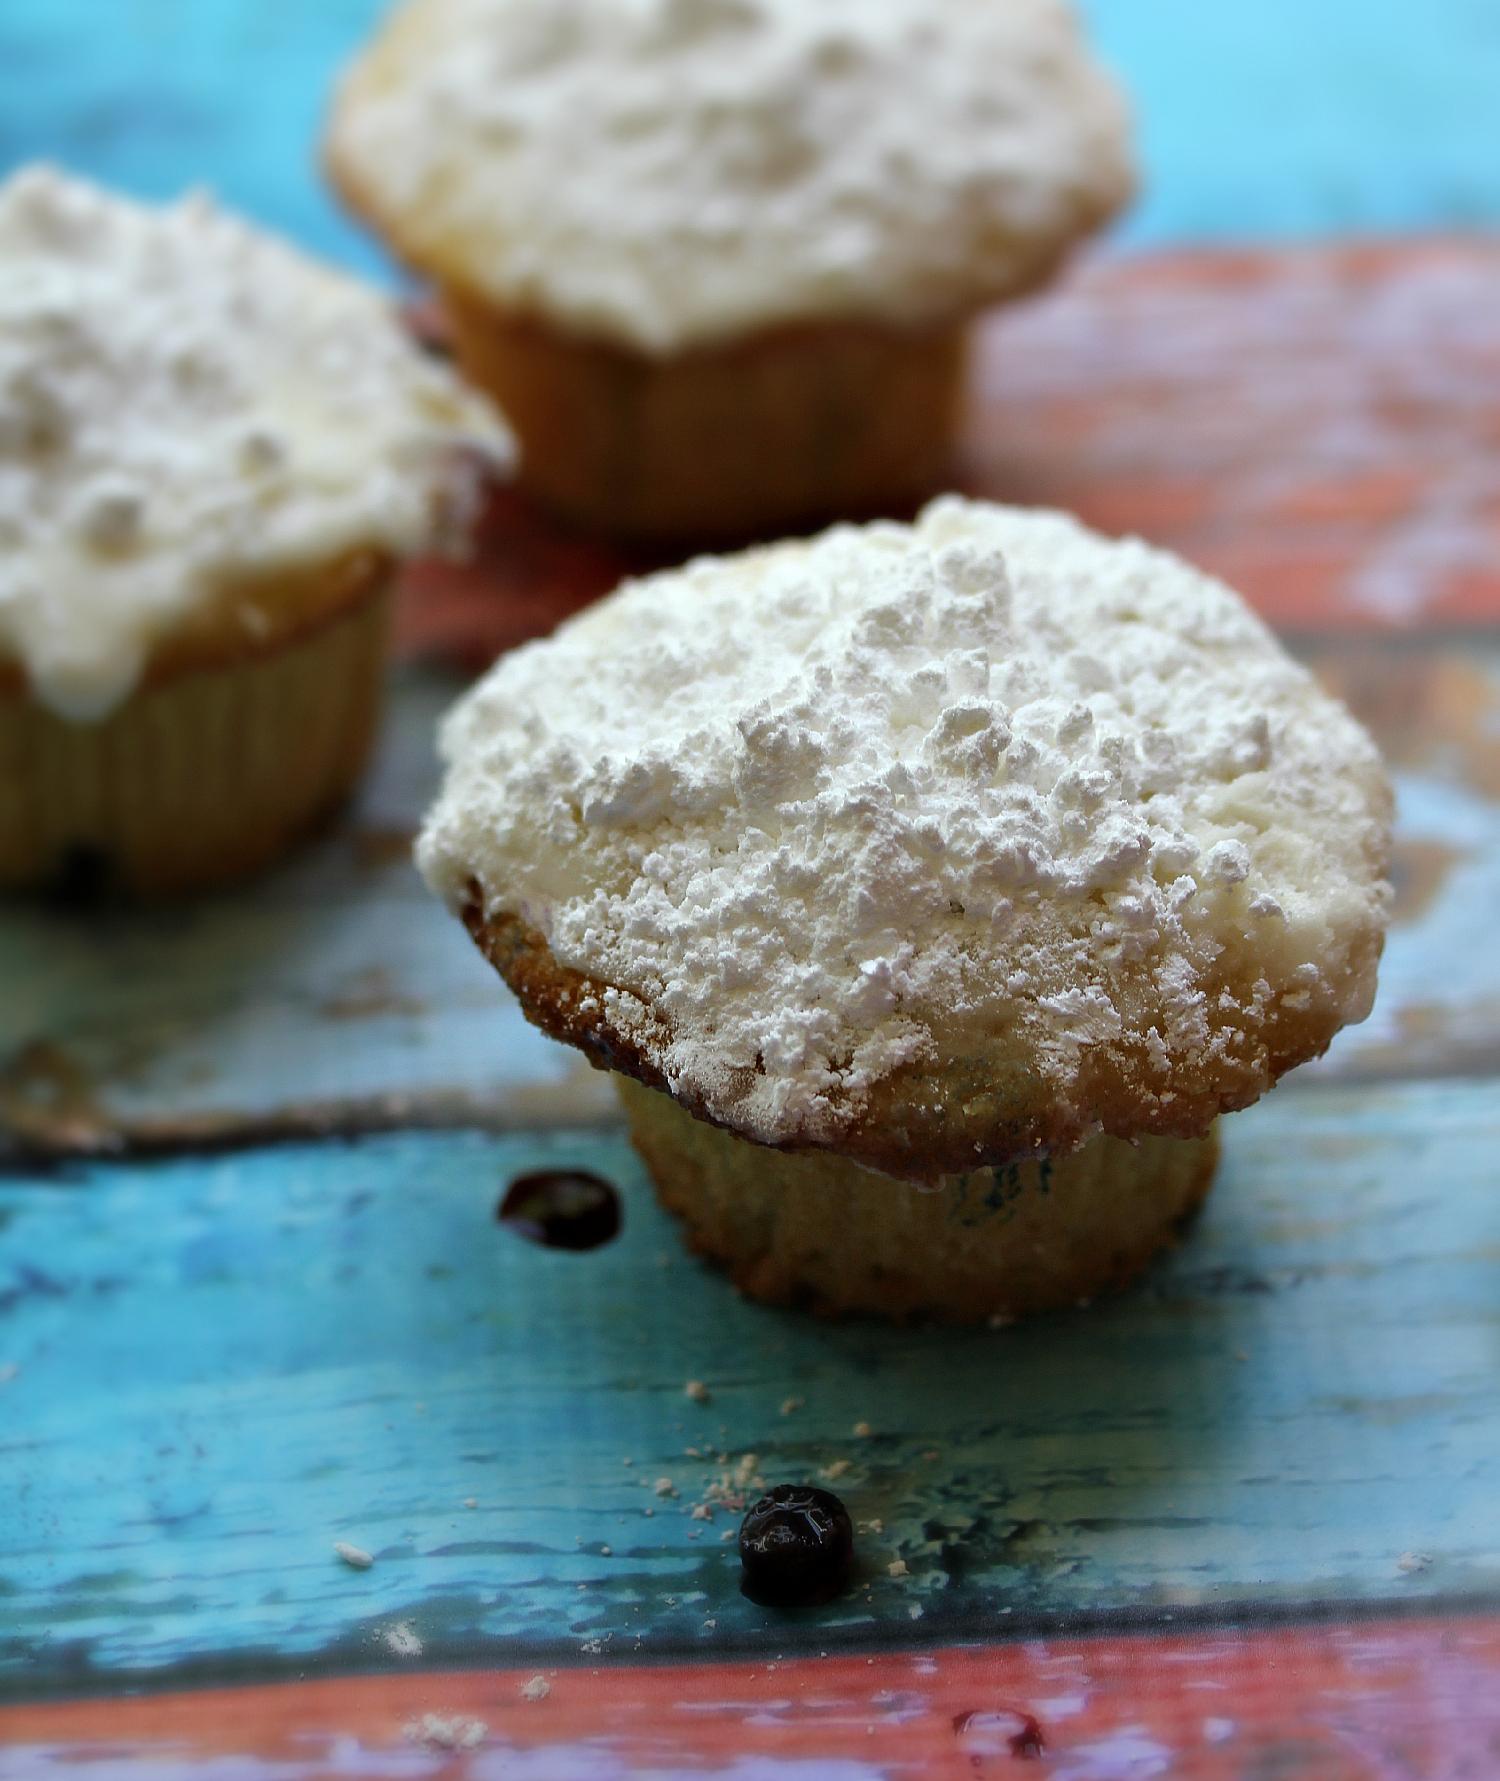 Yummy Lemon Cupcakes by Dena T Bray